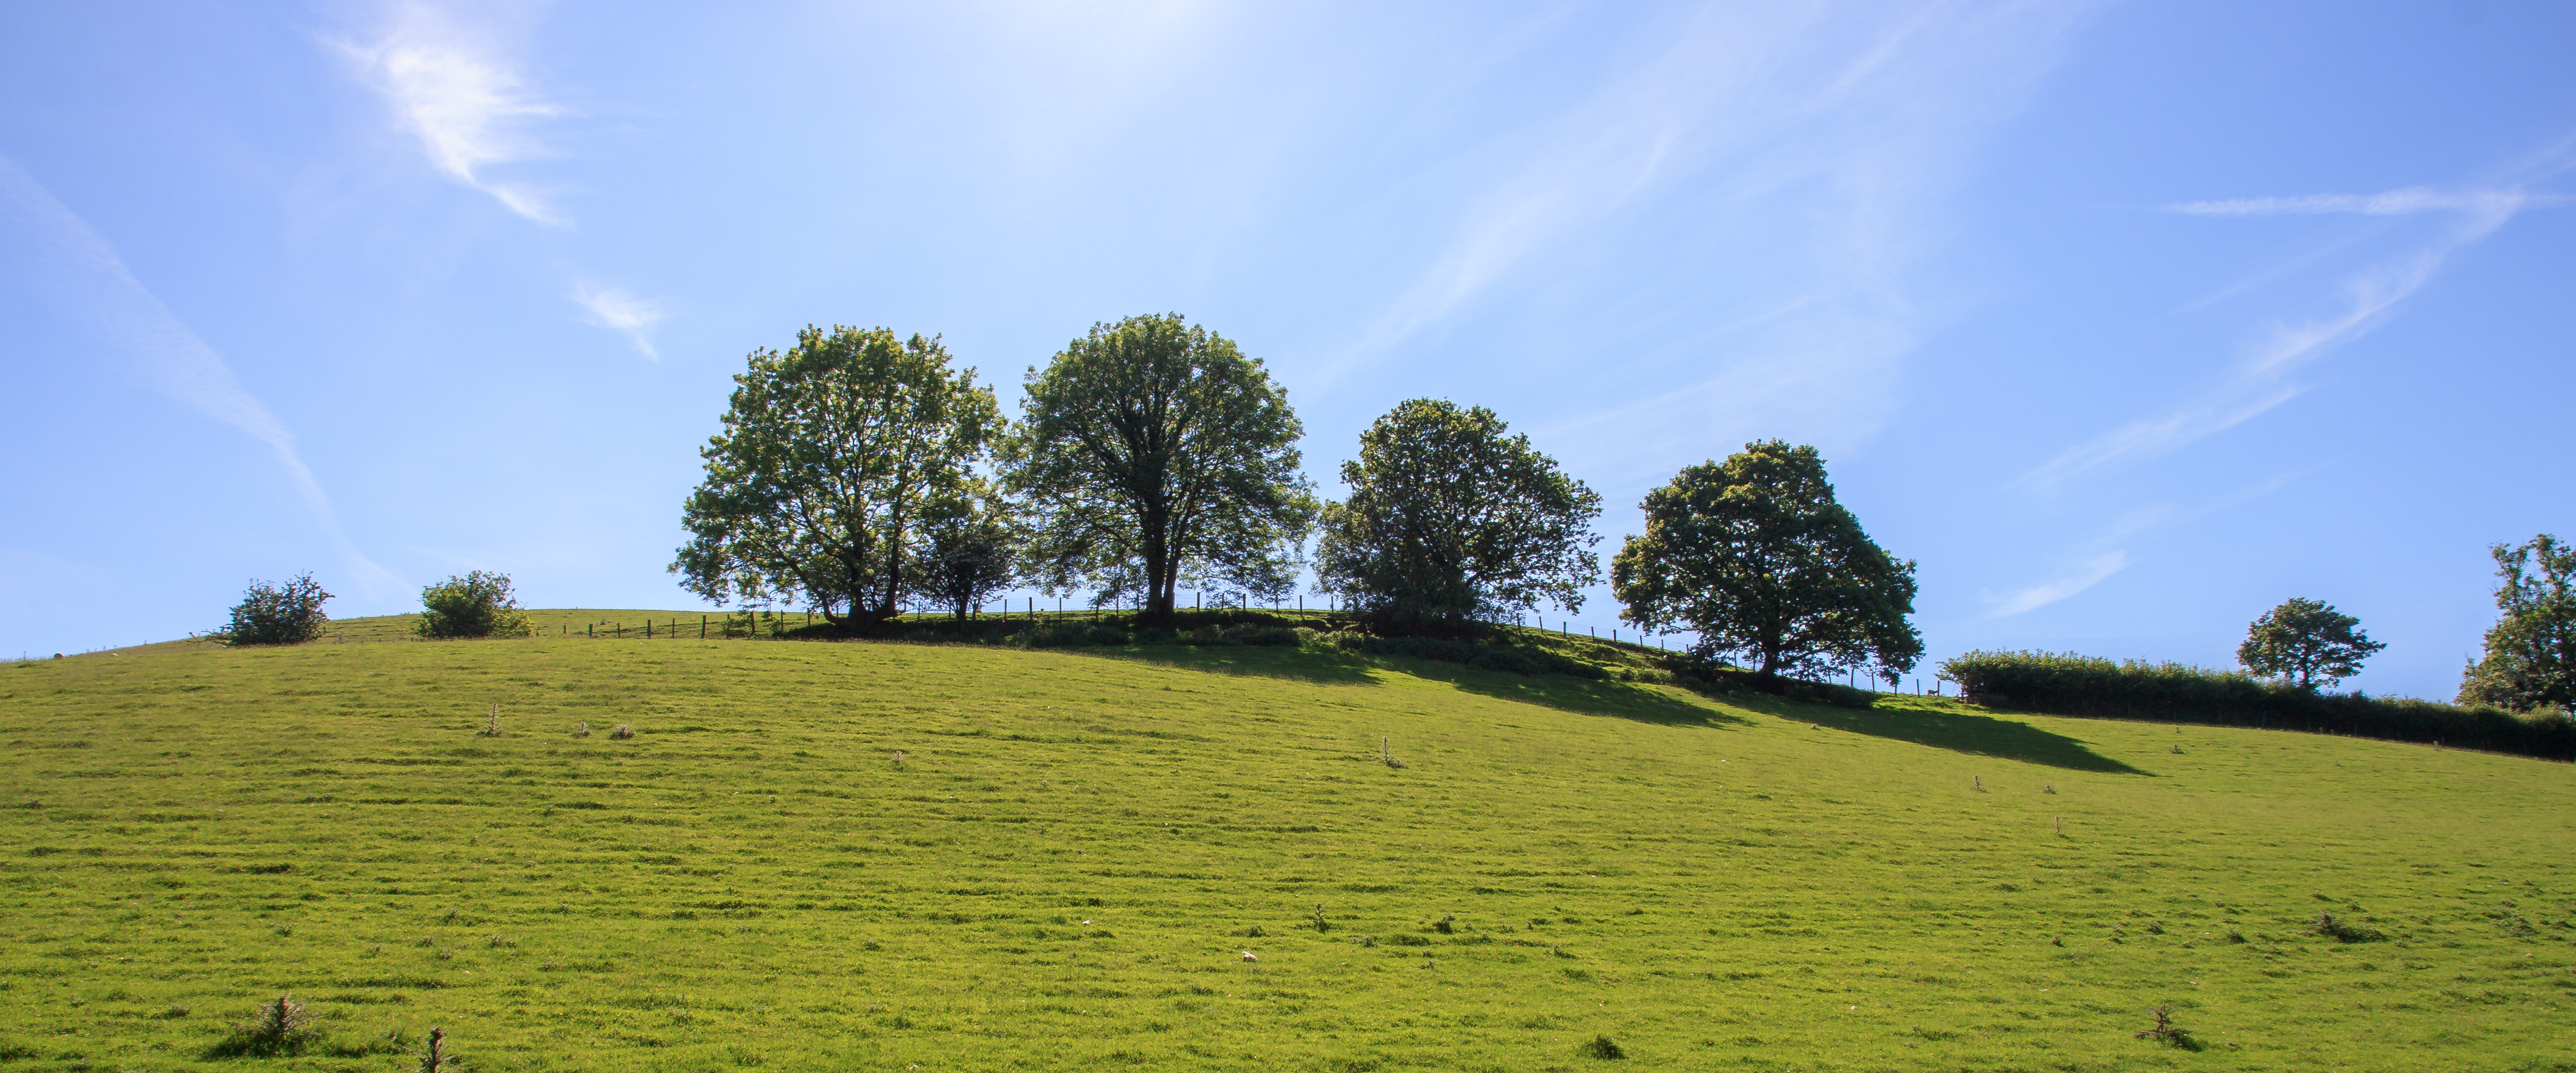 Trees above the Doone Valley on Exmoor